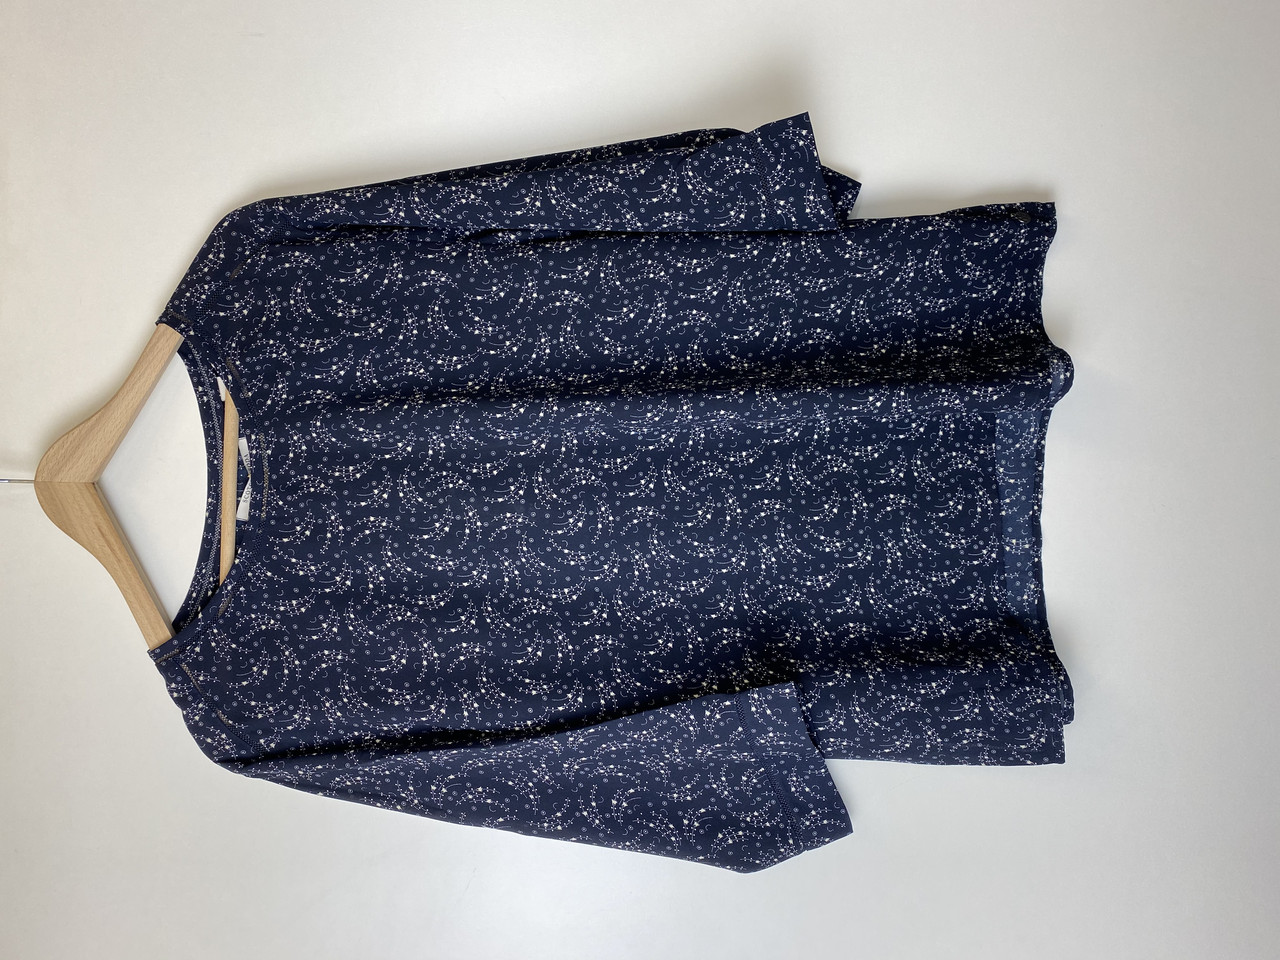 Блуза женская Maison Scotch цвет темно-синий- белый размер S XL XS арт 10216716-FWLM-D53